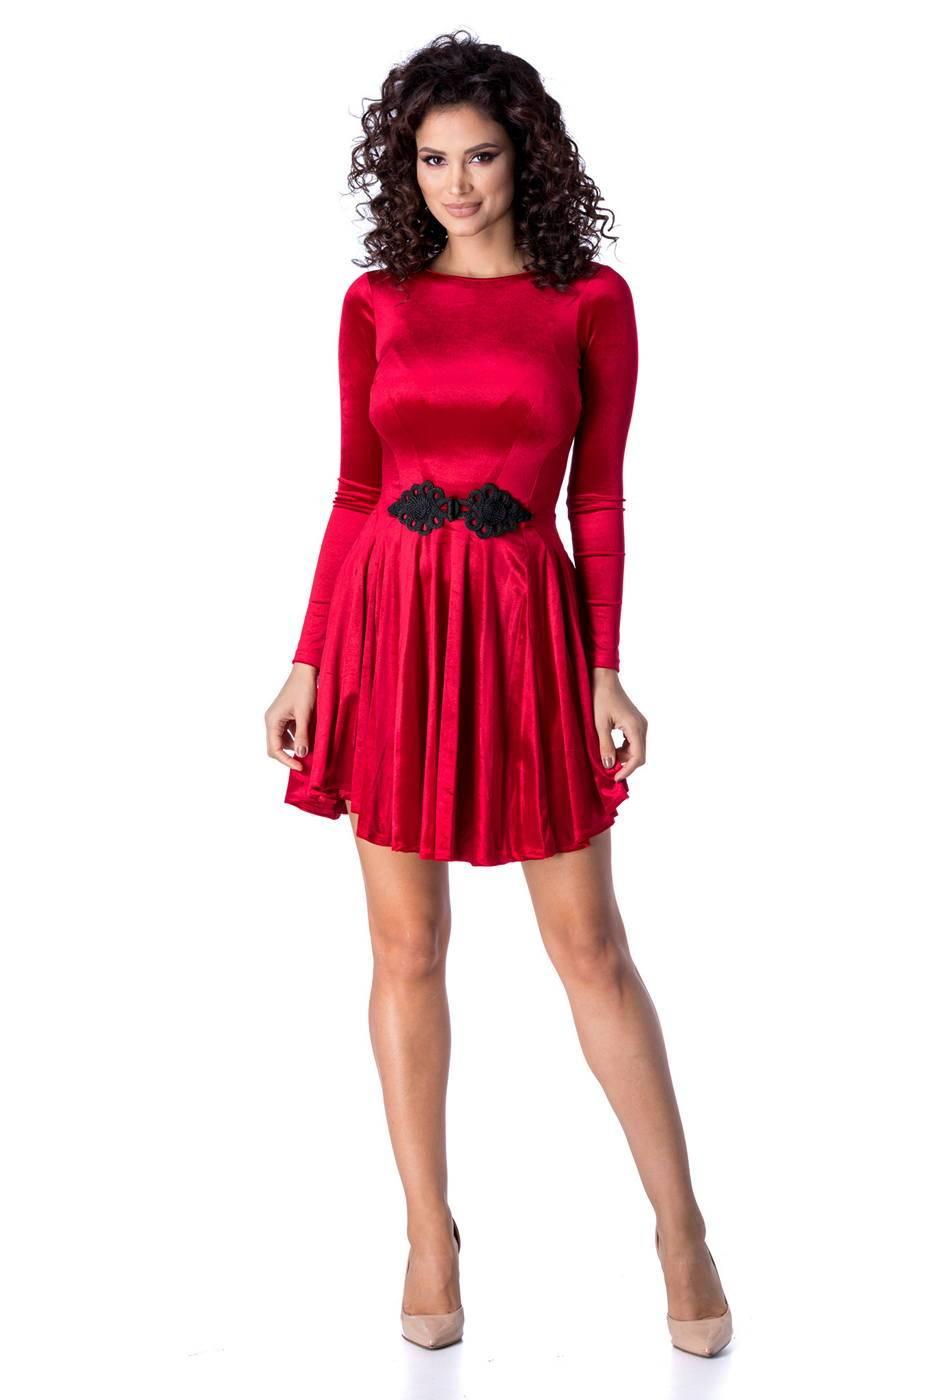 Mirrey Marsala Dress